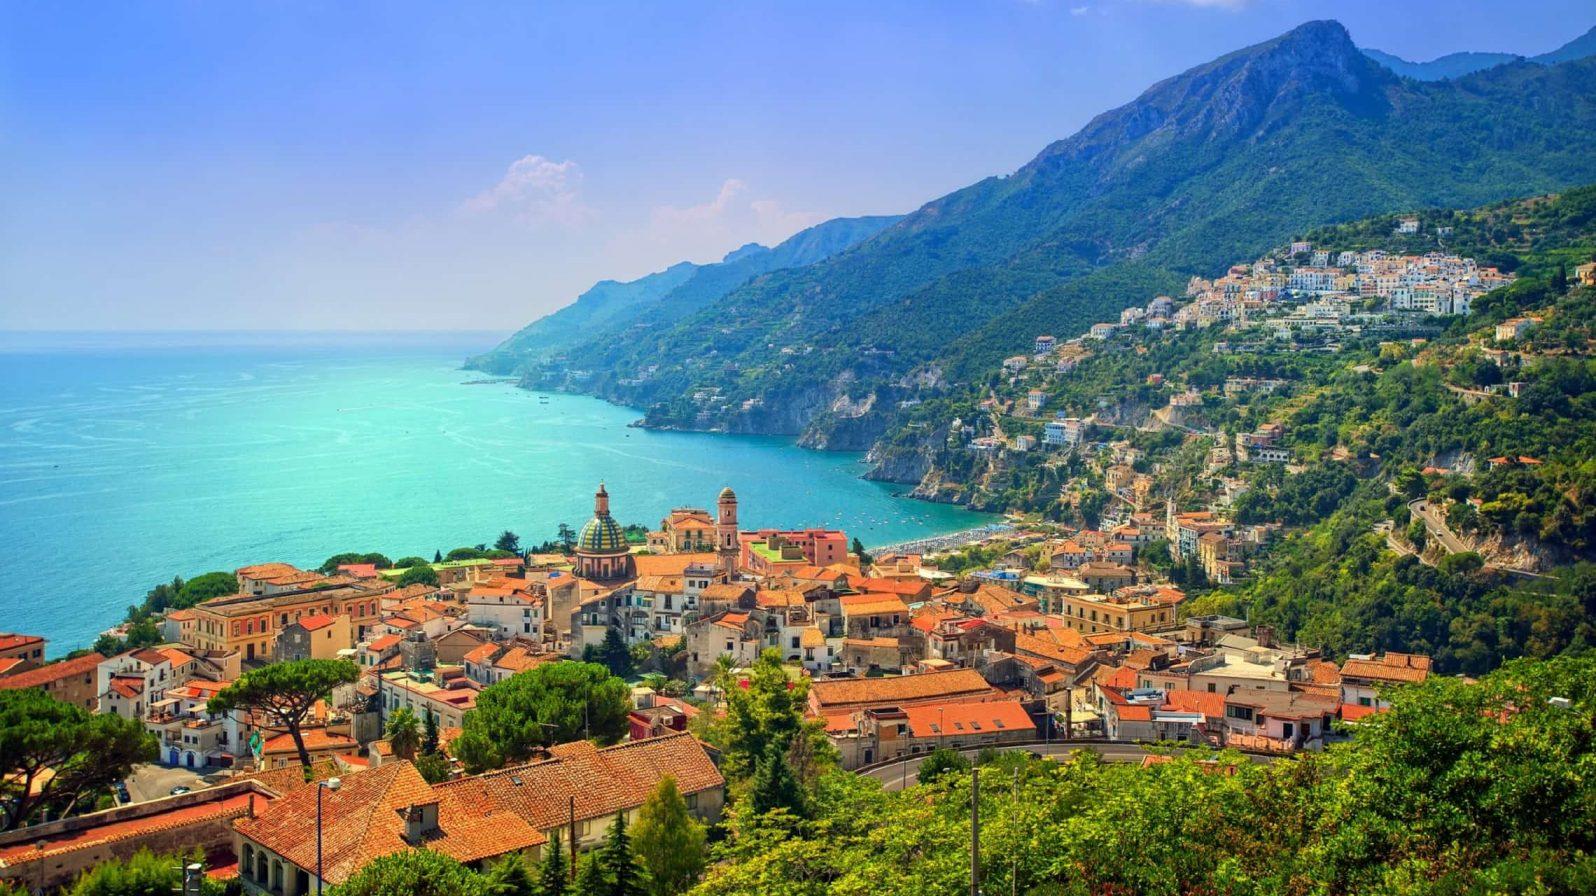 Salerno-Amalfi-Italia-1596x896.jpeg